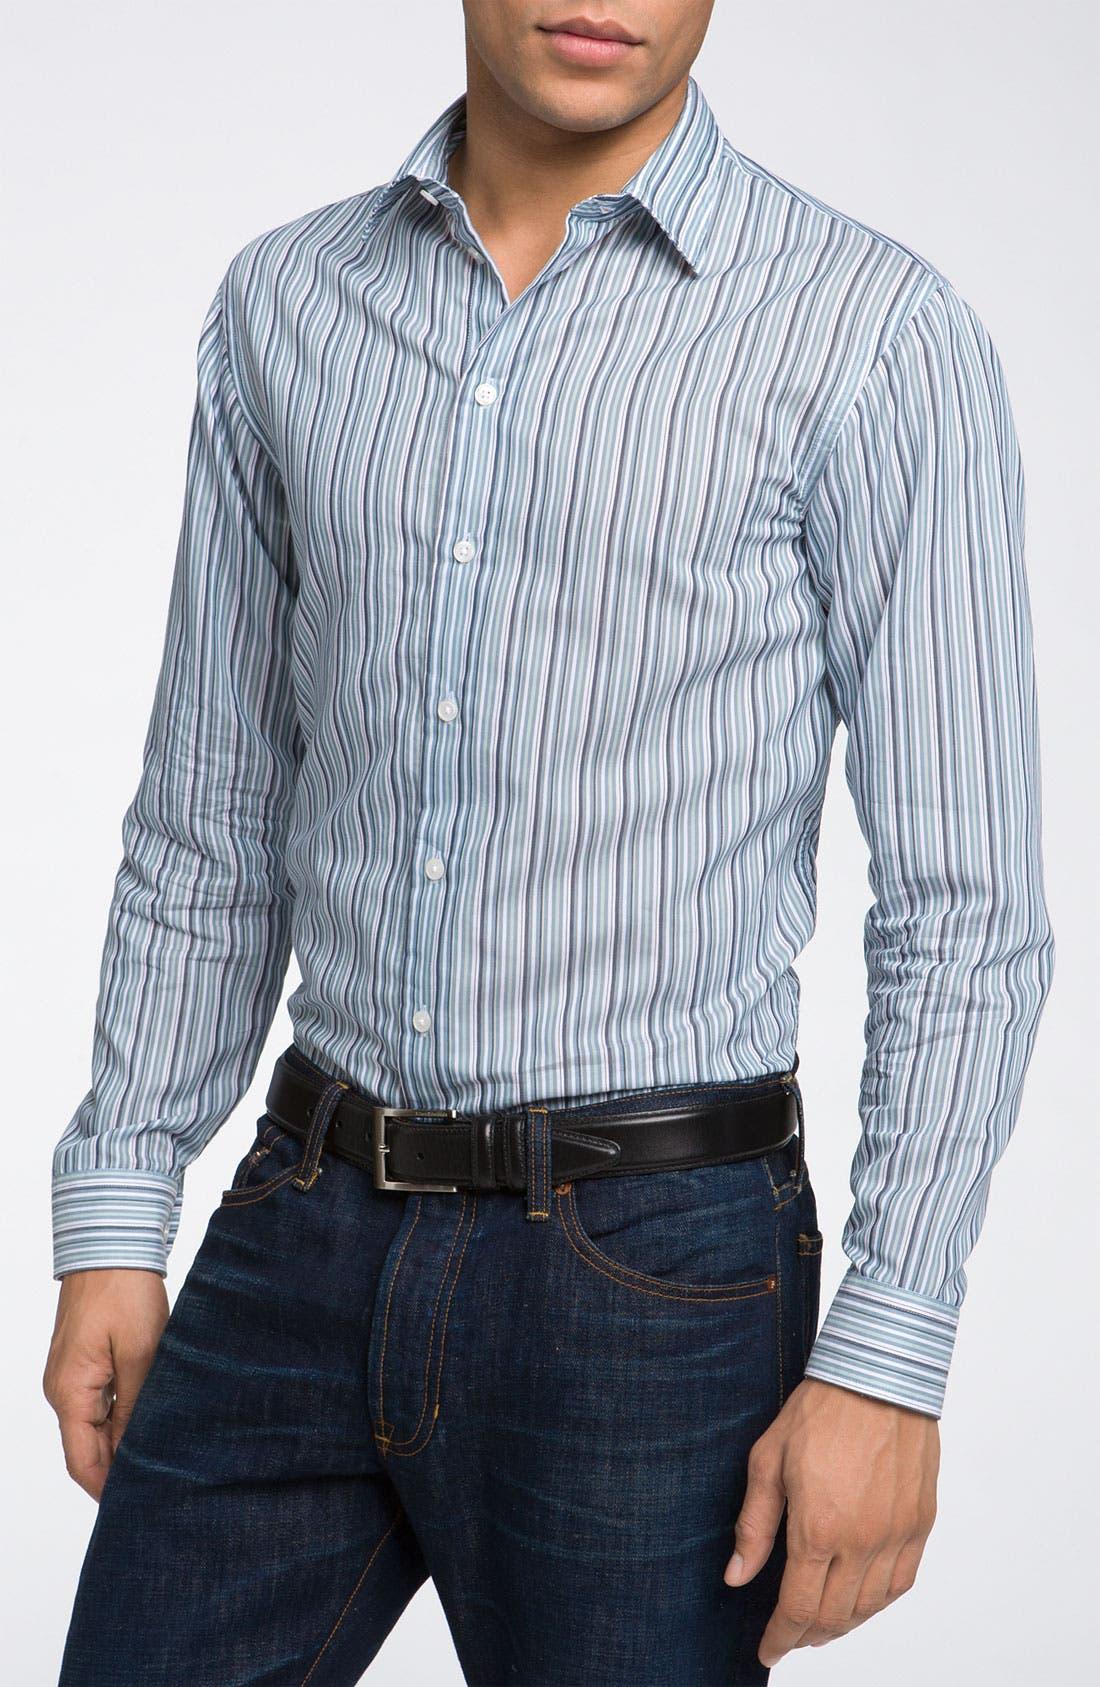 Alternate Image 1 Selected - Armani Collezioni Stripe Woven Shirt